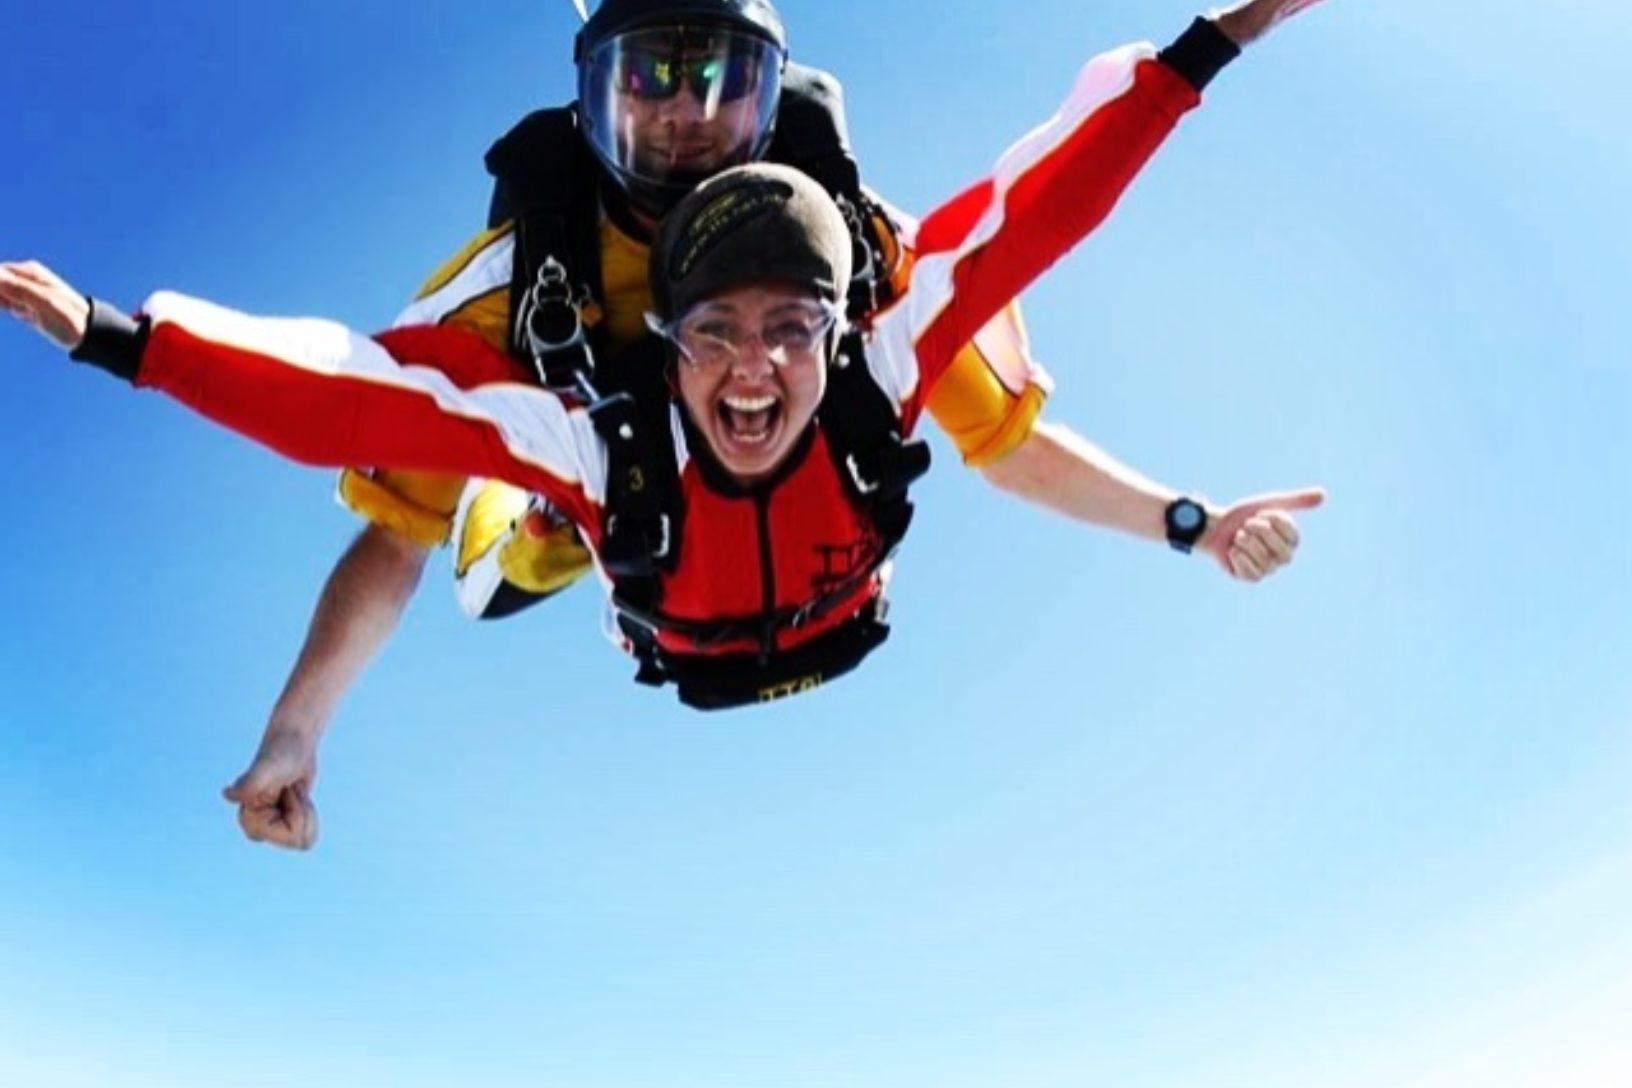 Corinne skydive